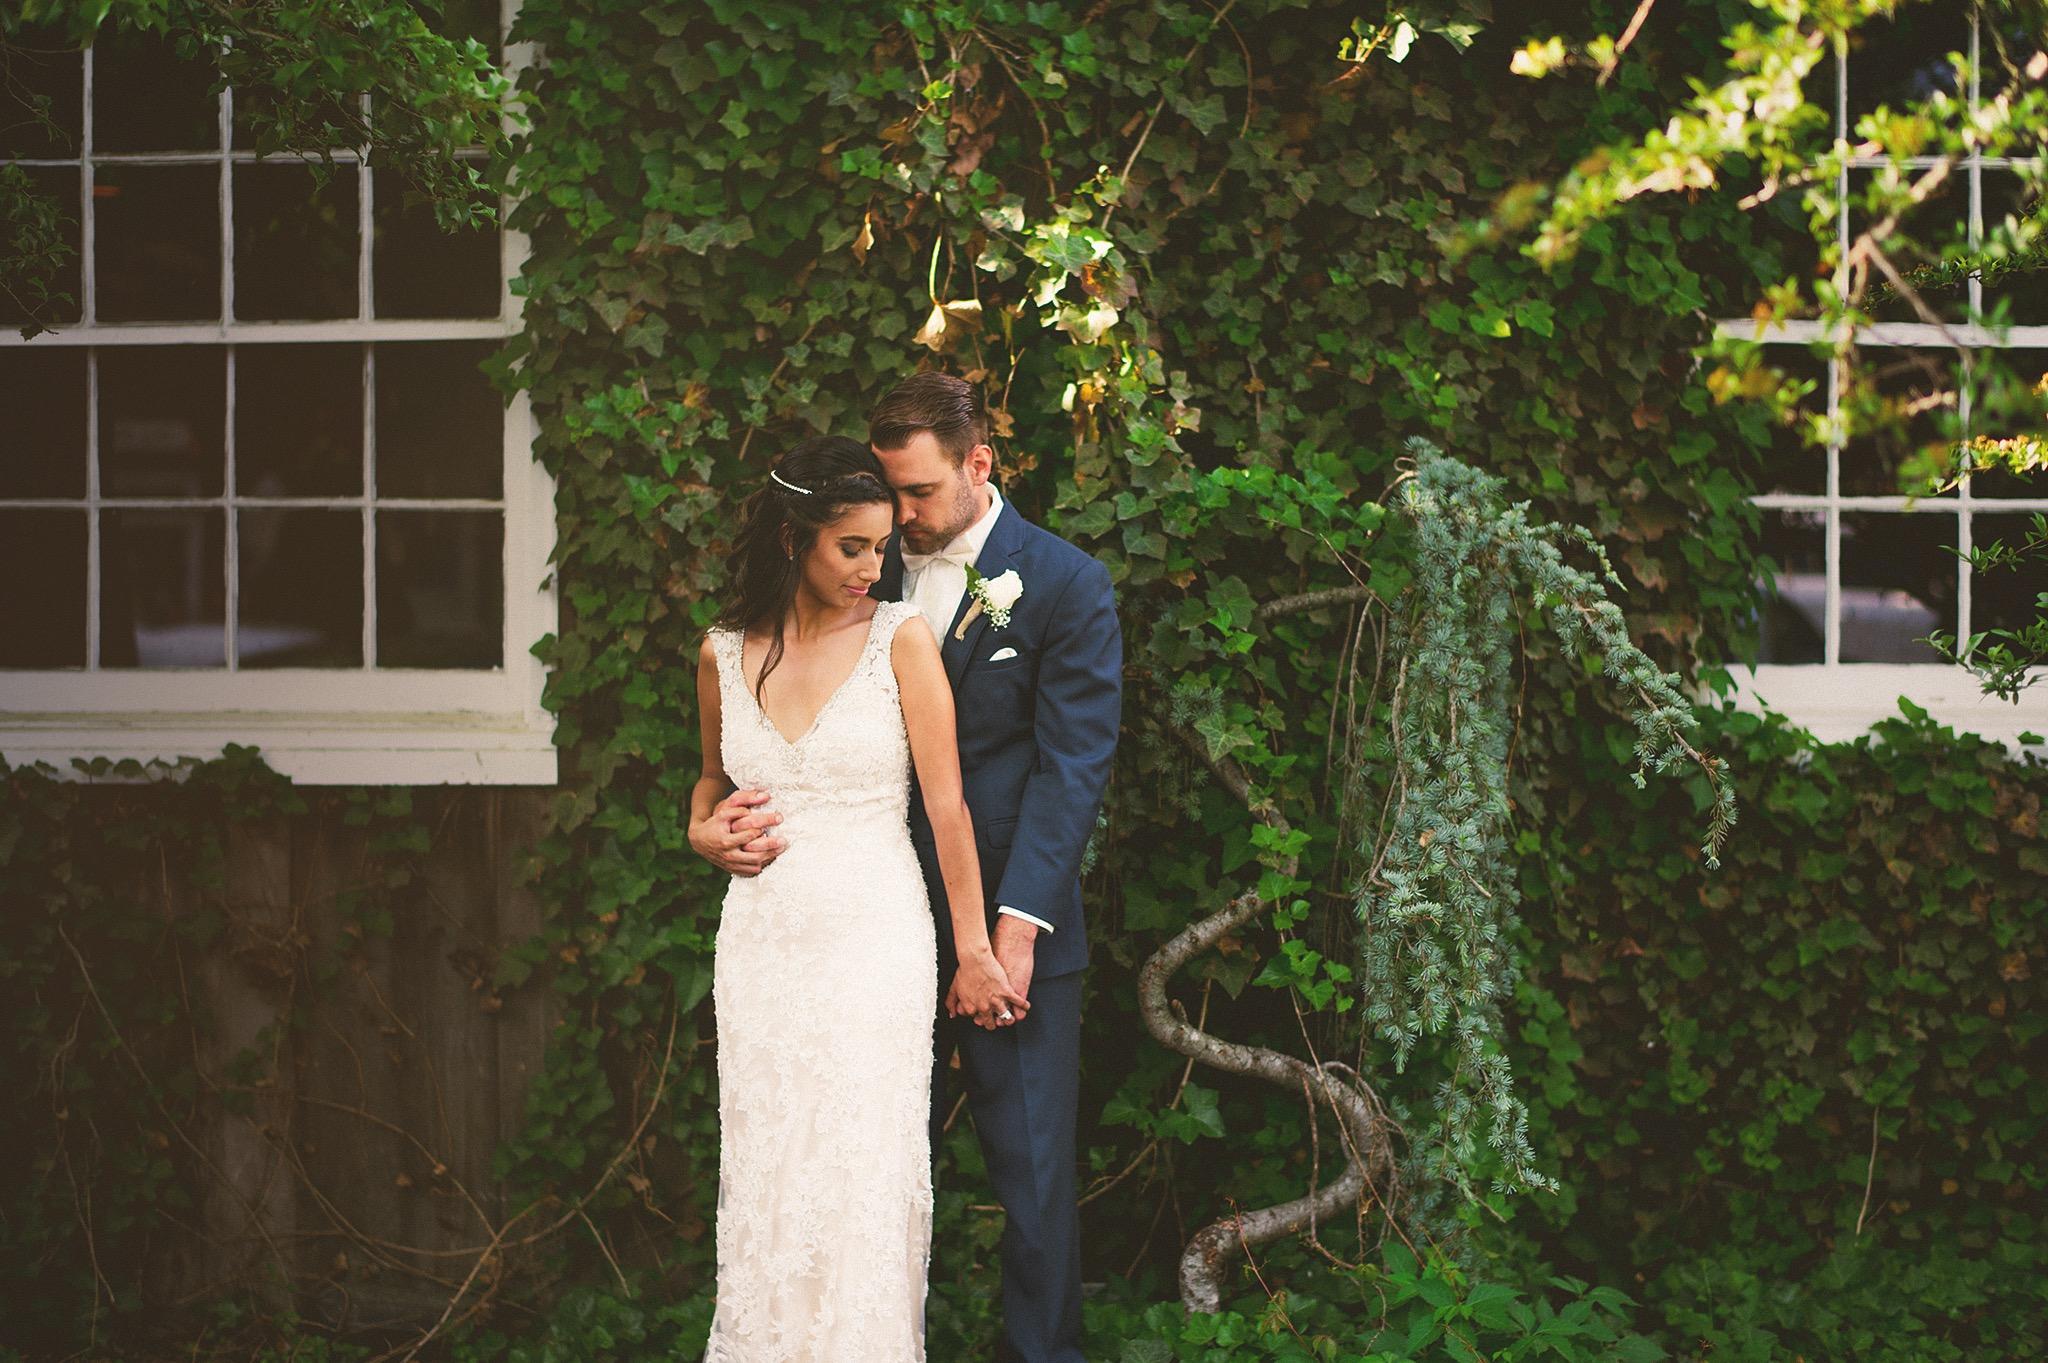 65-best-nj-wedding-photographers.jpg